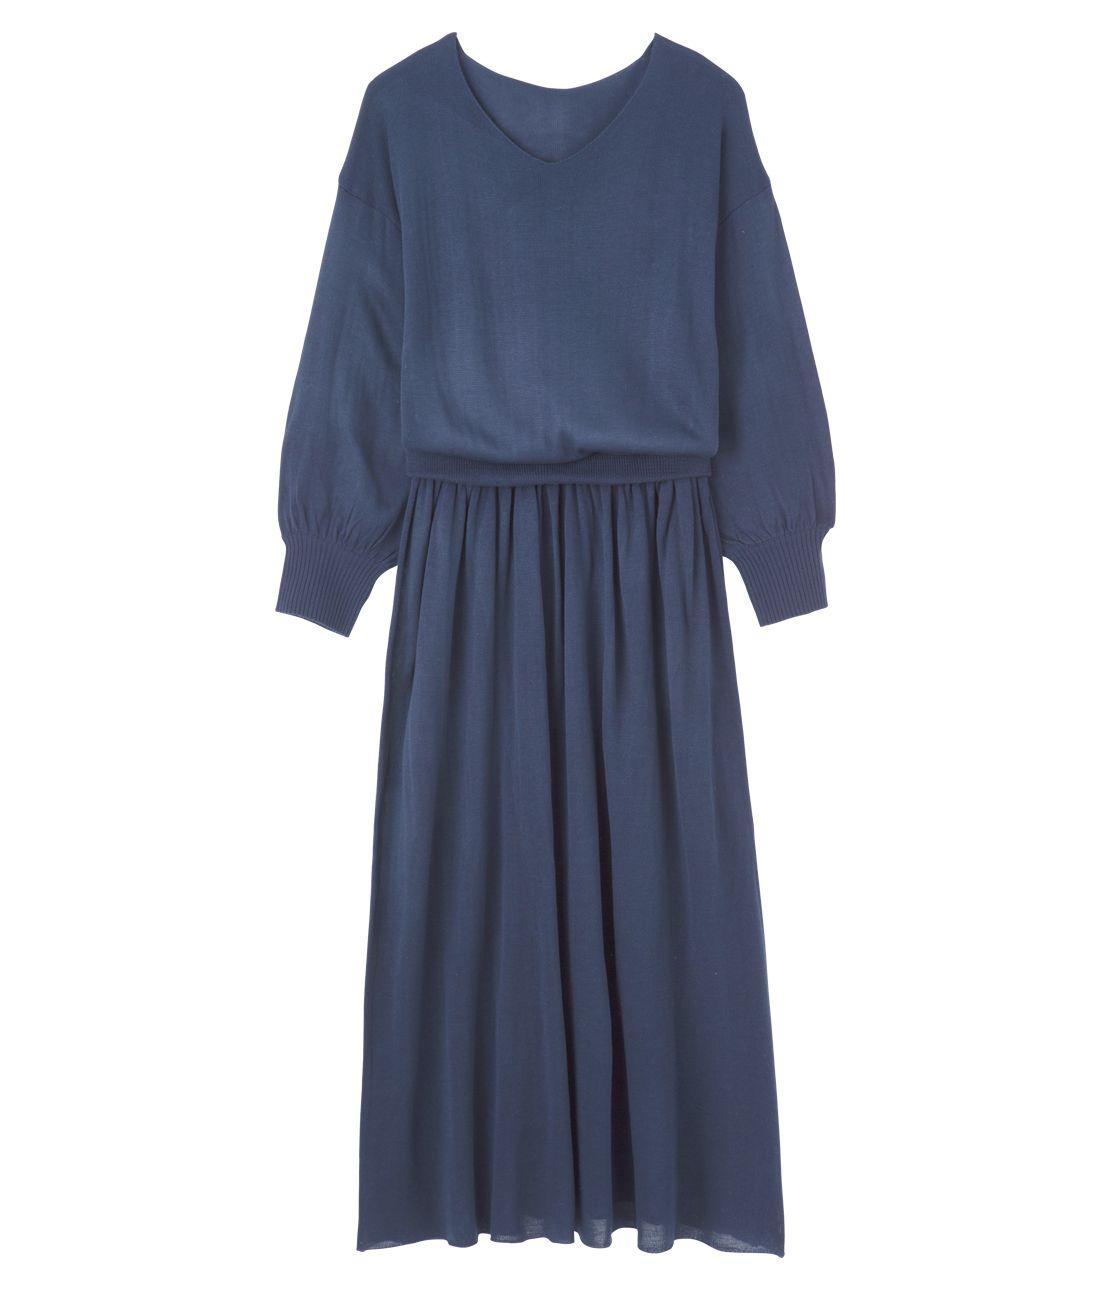 Flare knit dress